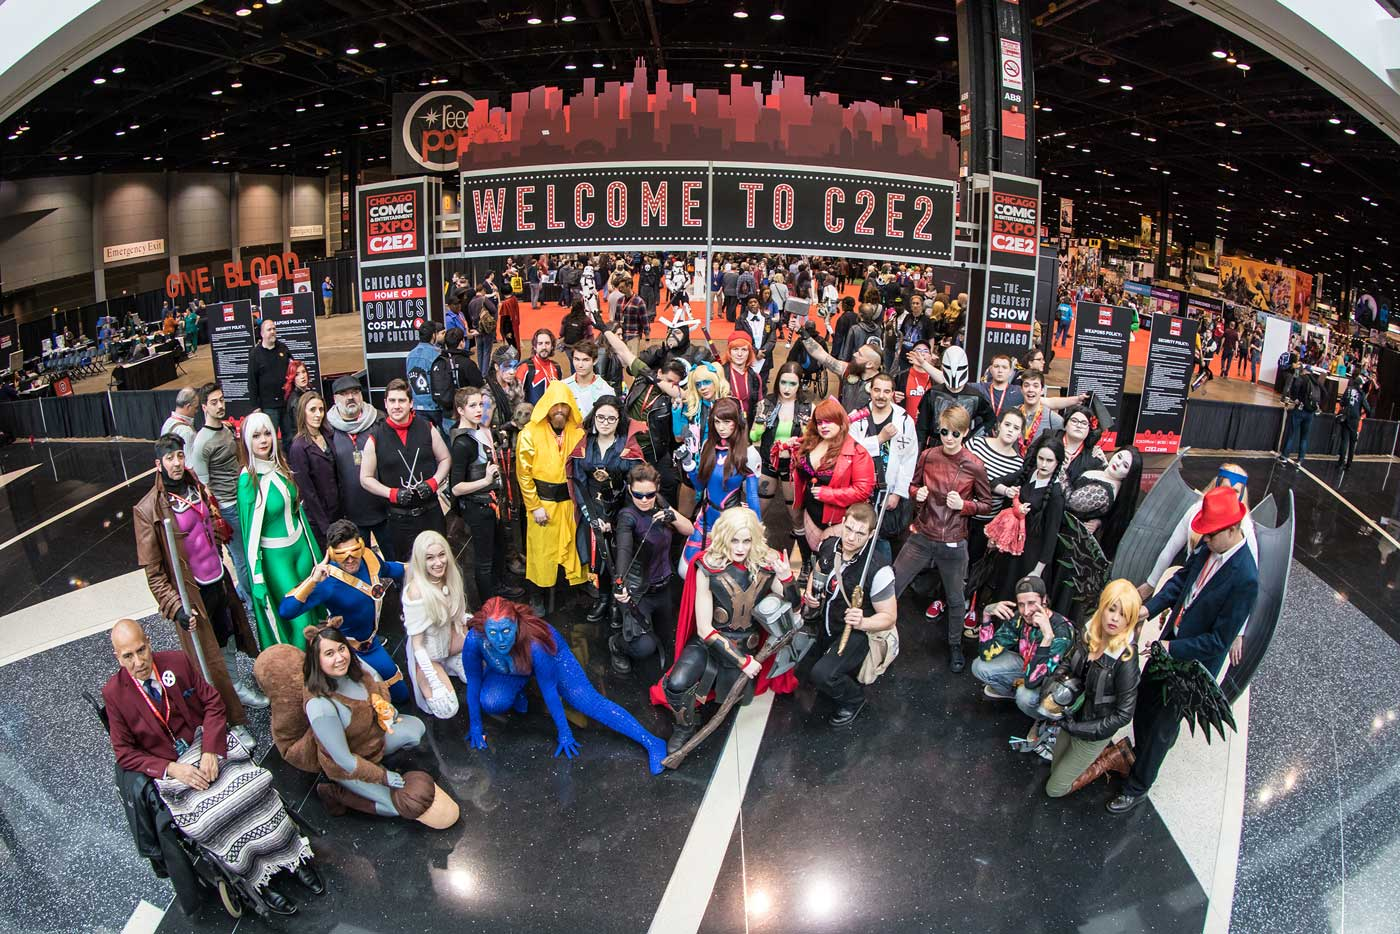 Chicago Comic and Entertainment Expo (C2E2)